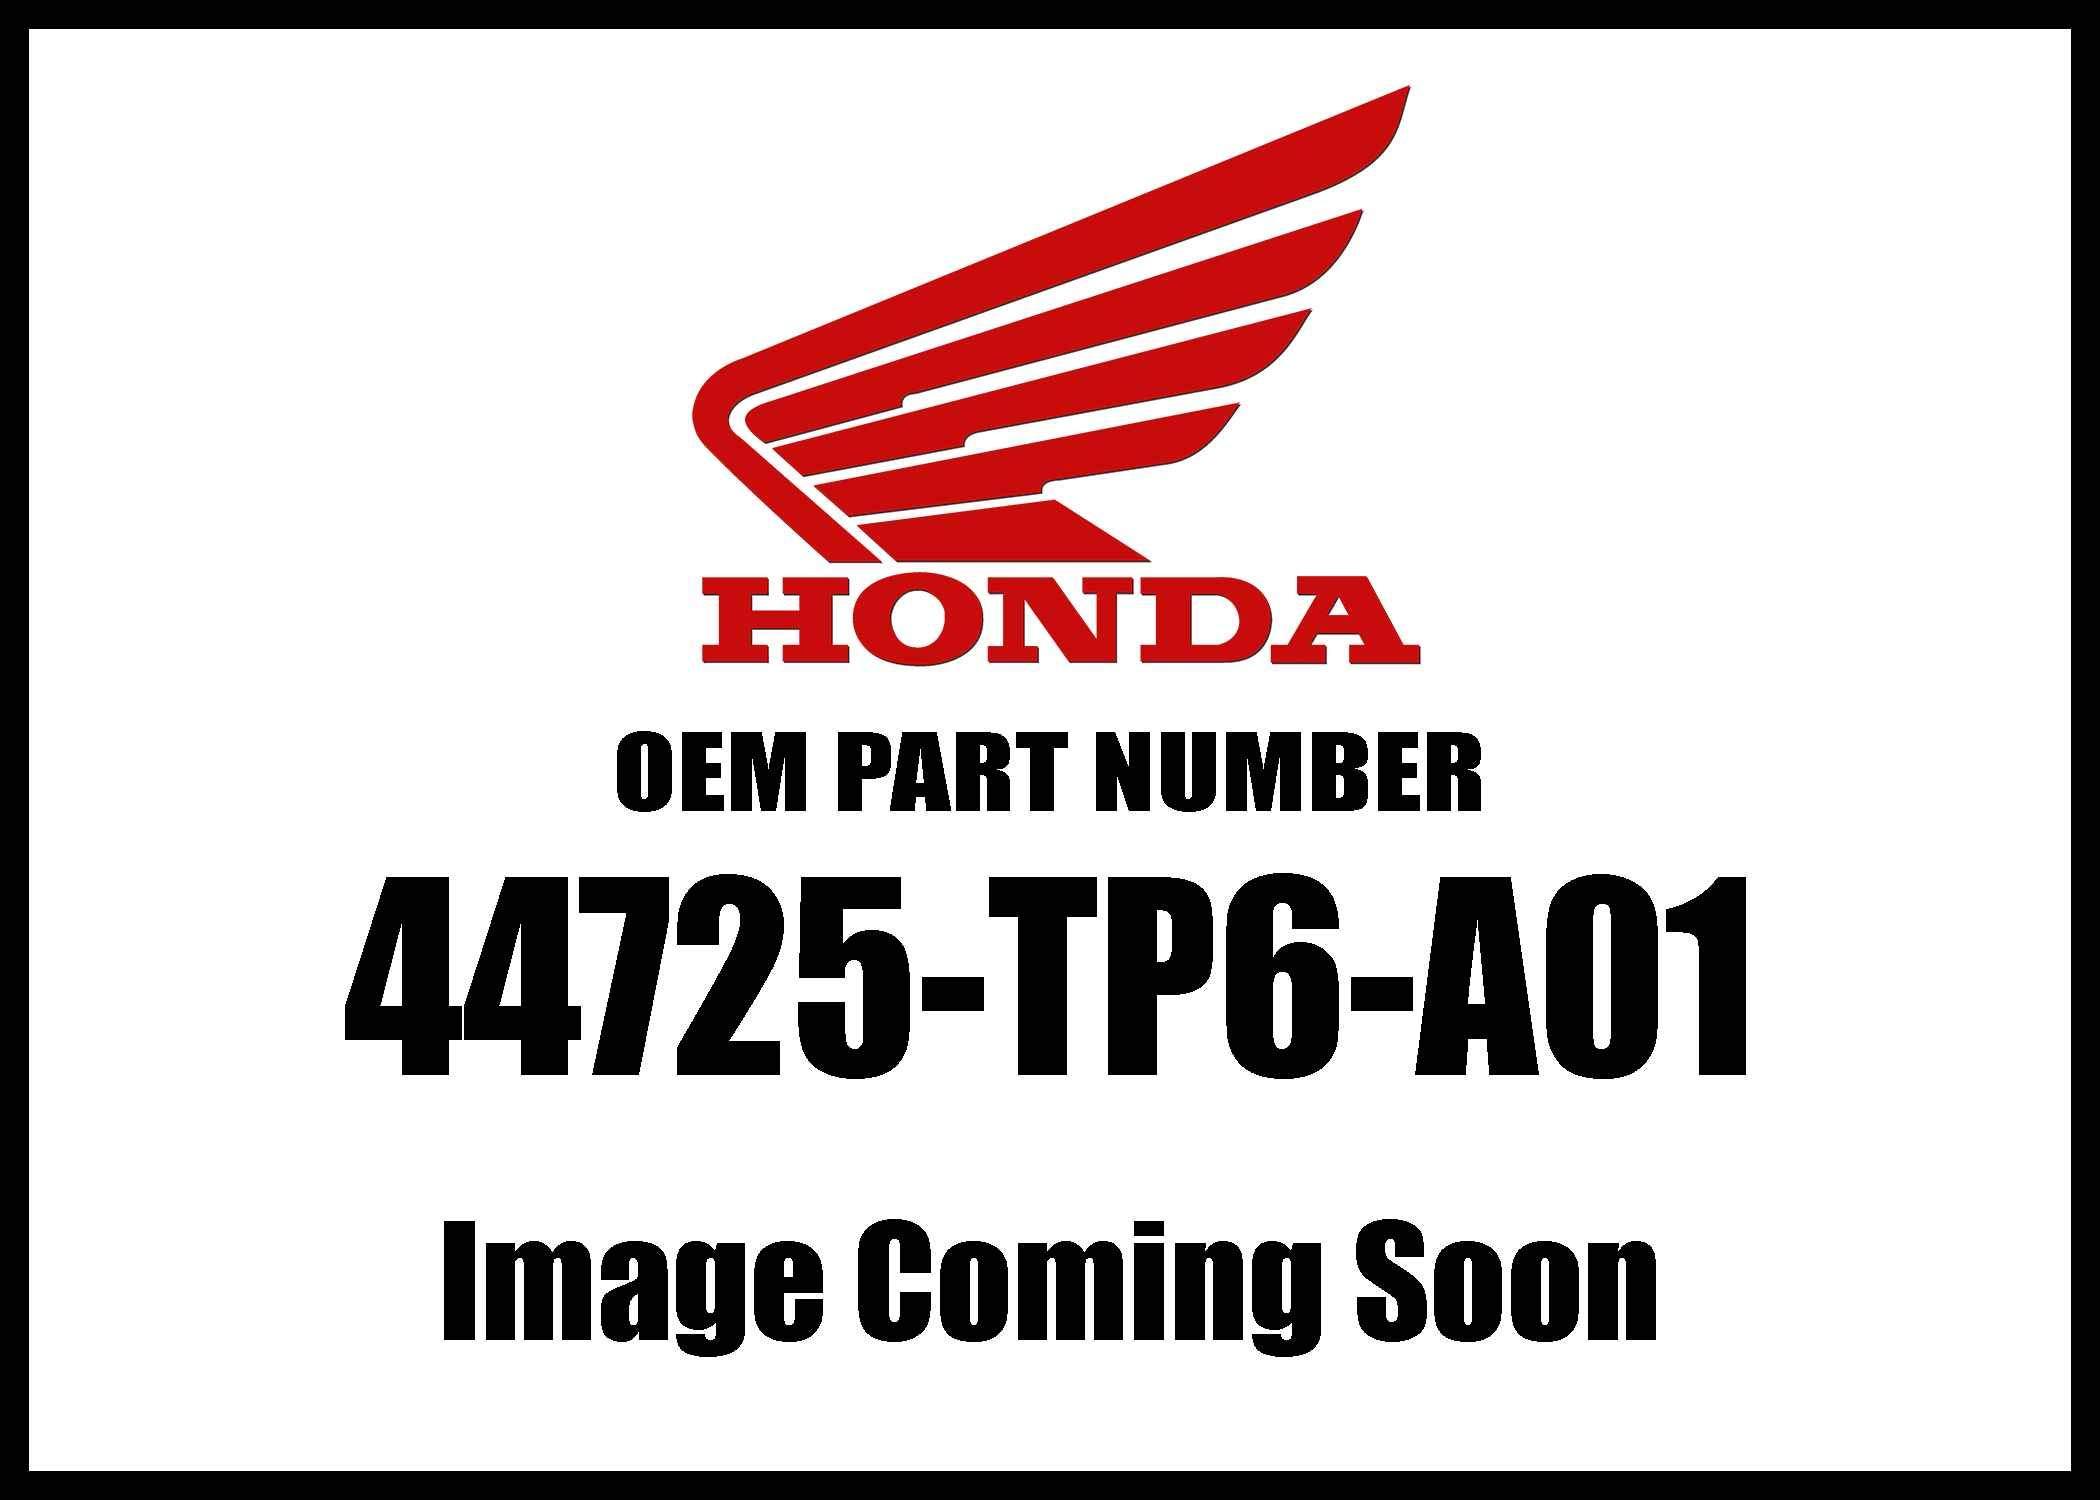 Honda Crosstour 13 Weight 25G 44725-Tp6-A01 New Oem